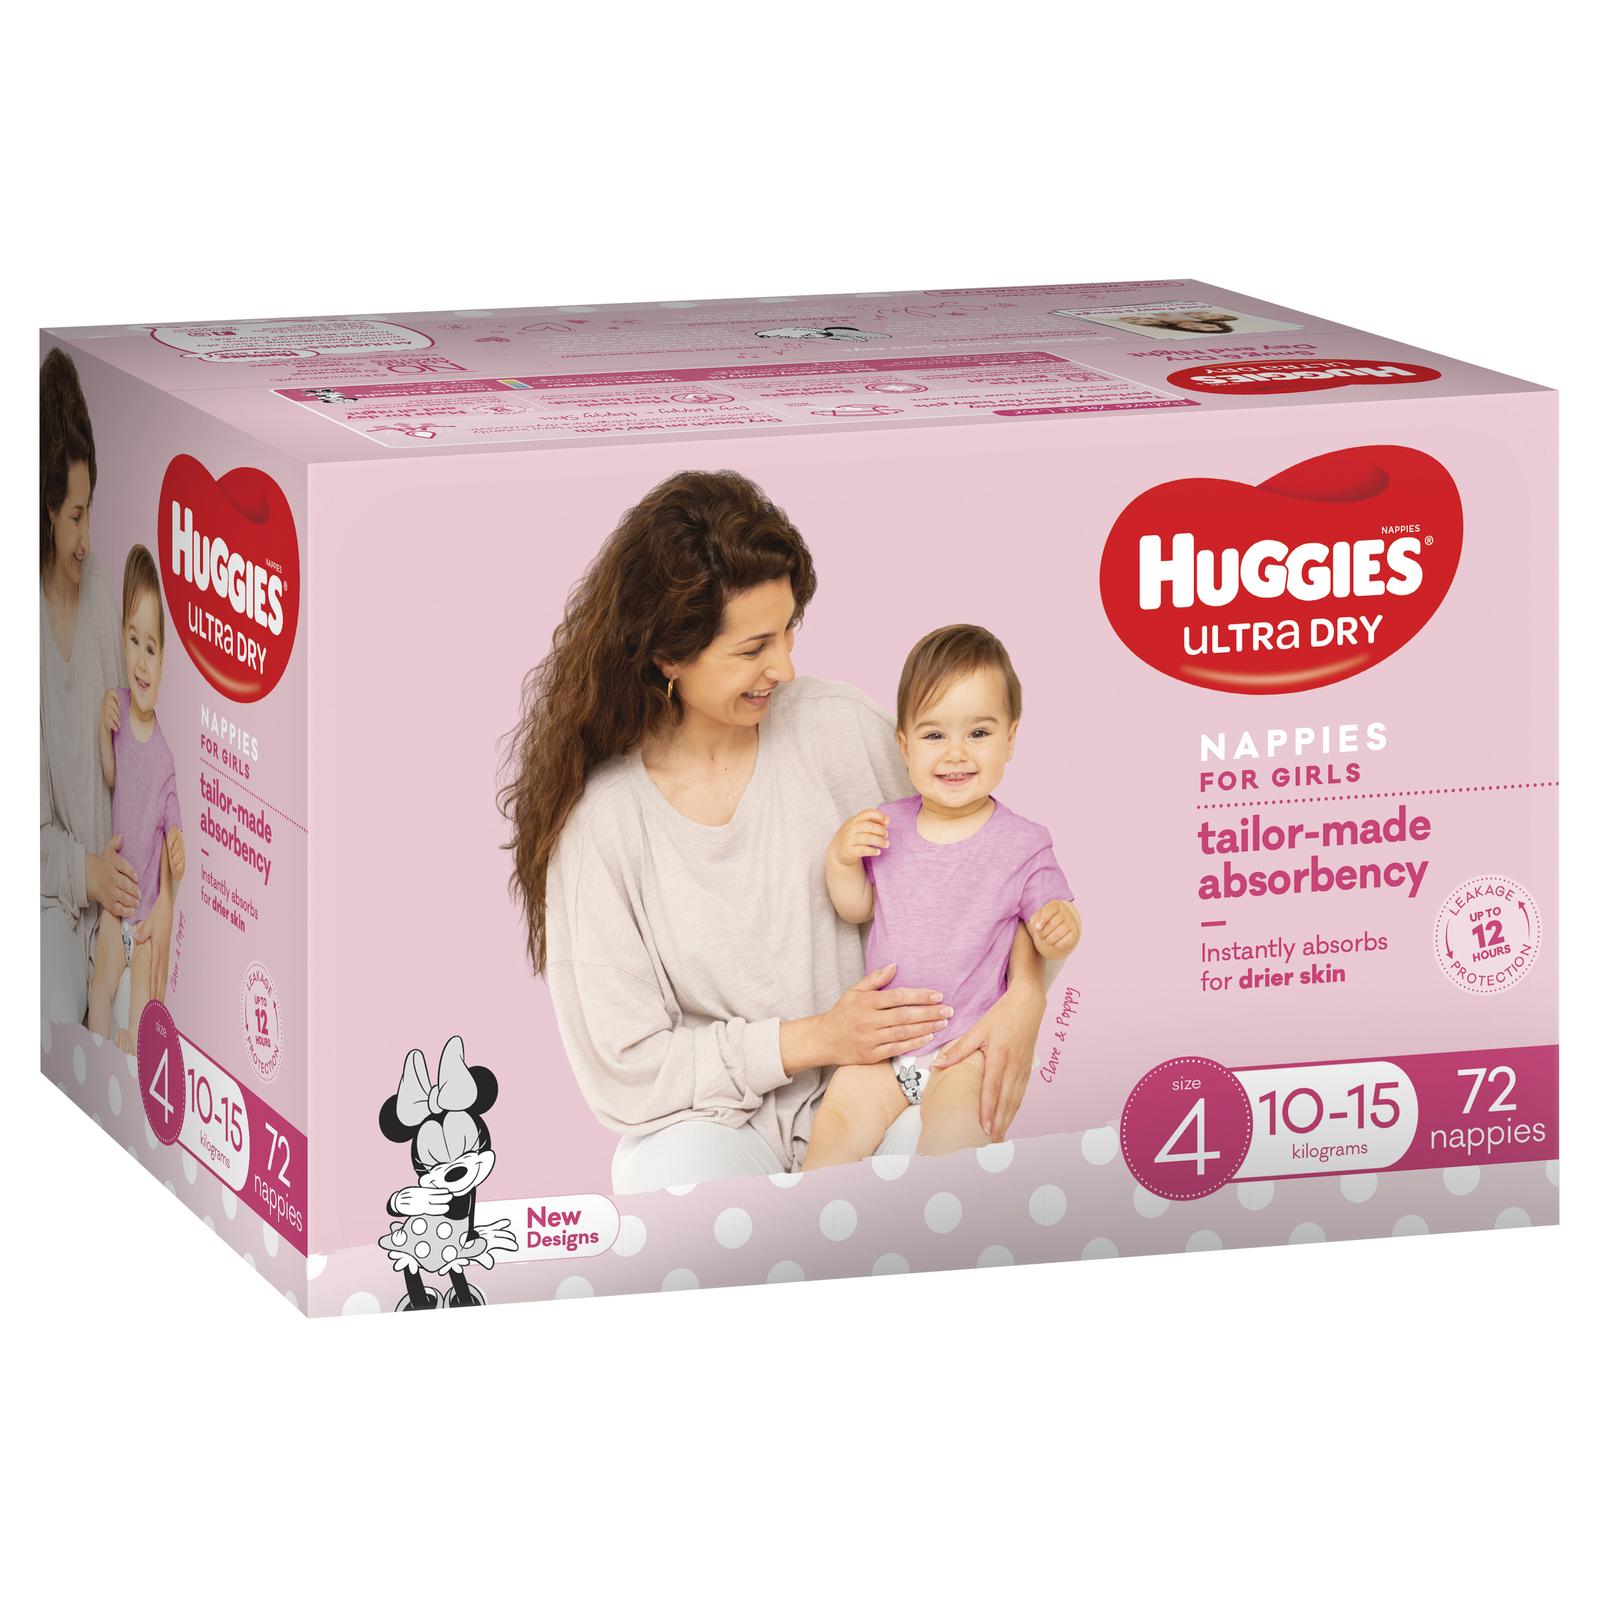 Huggies Ultra Dry Nappies Jumbo Pack - Size 4 Toddler Girl (72) image